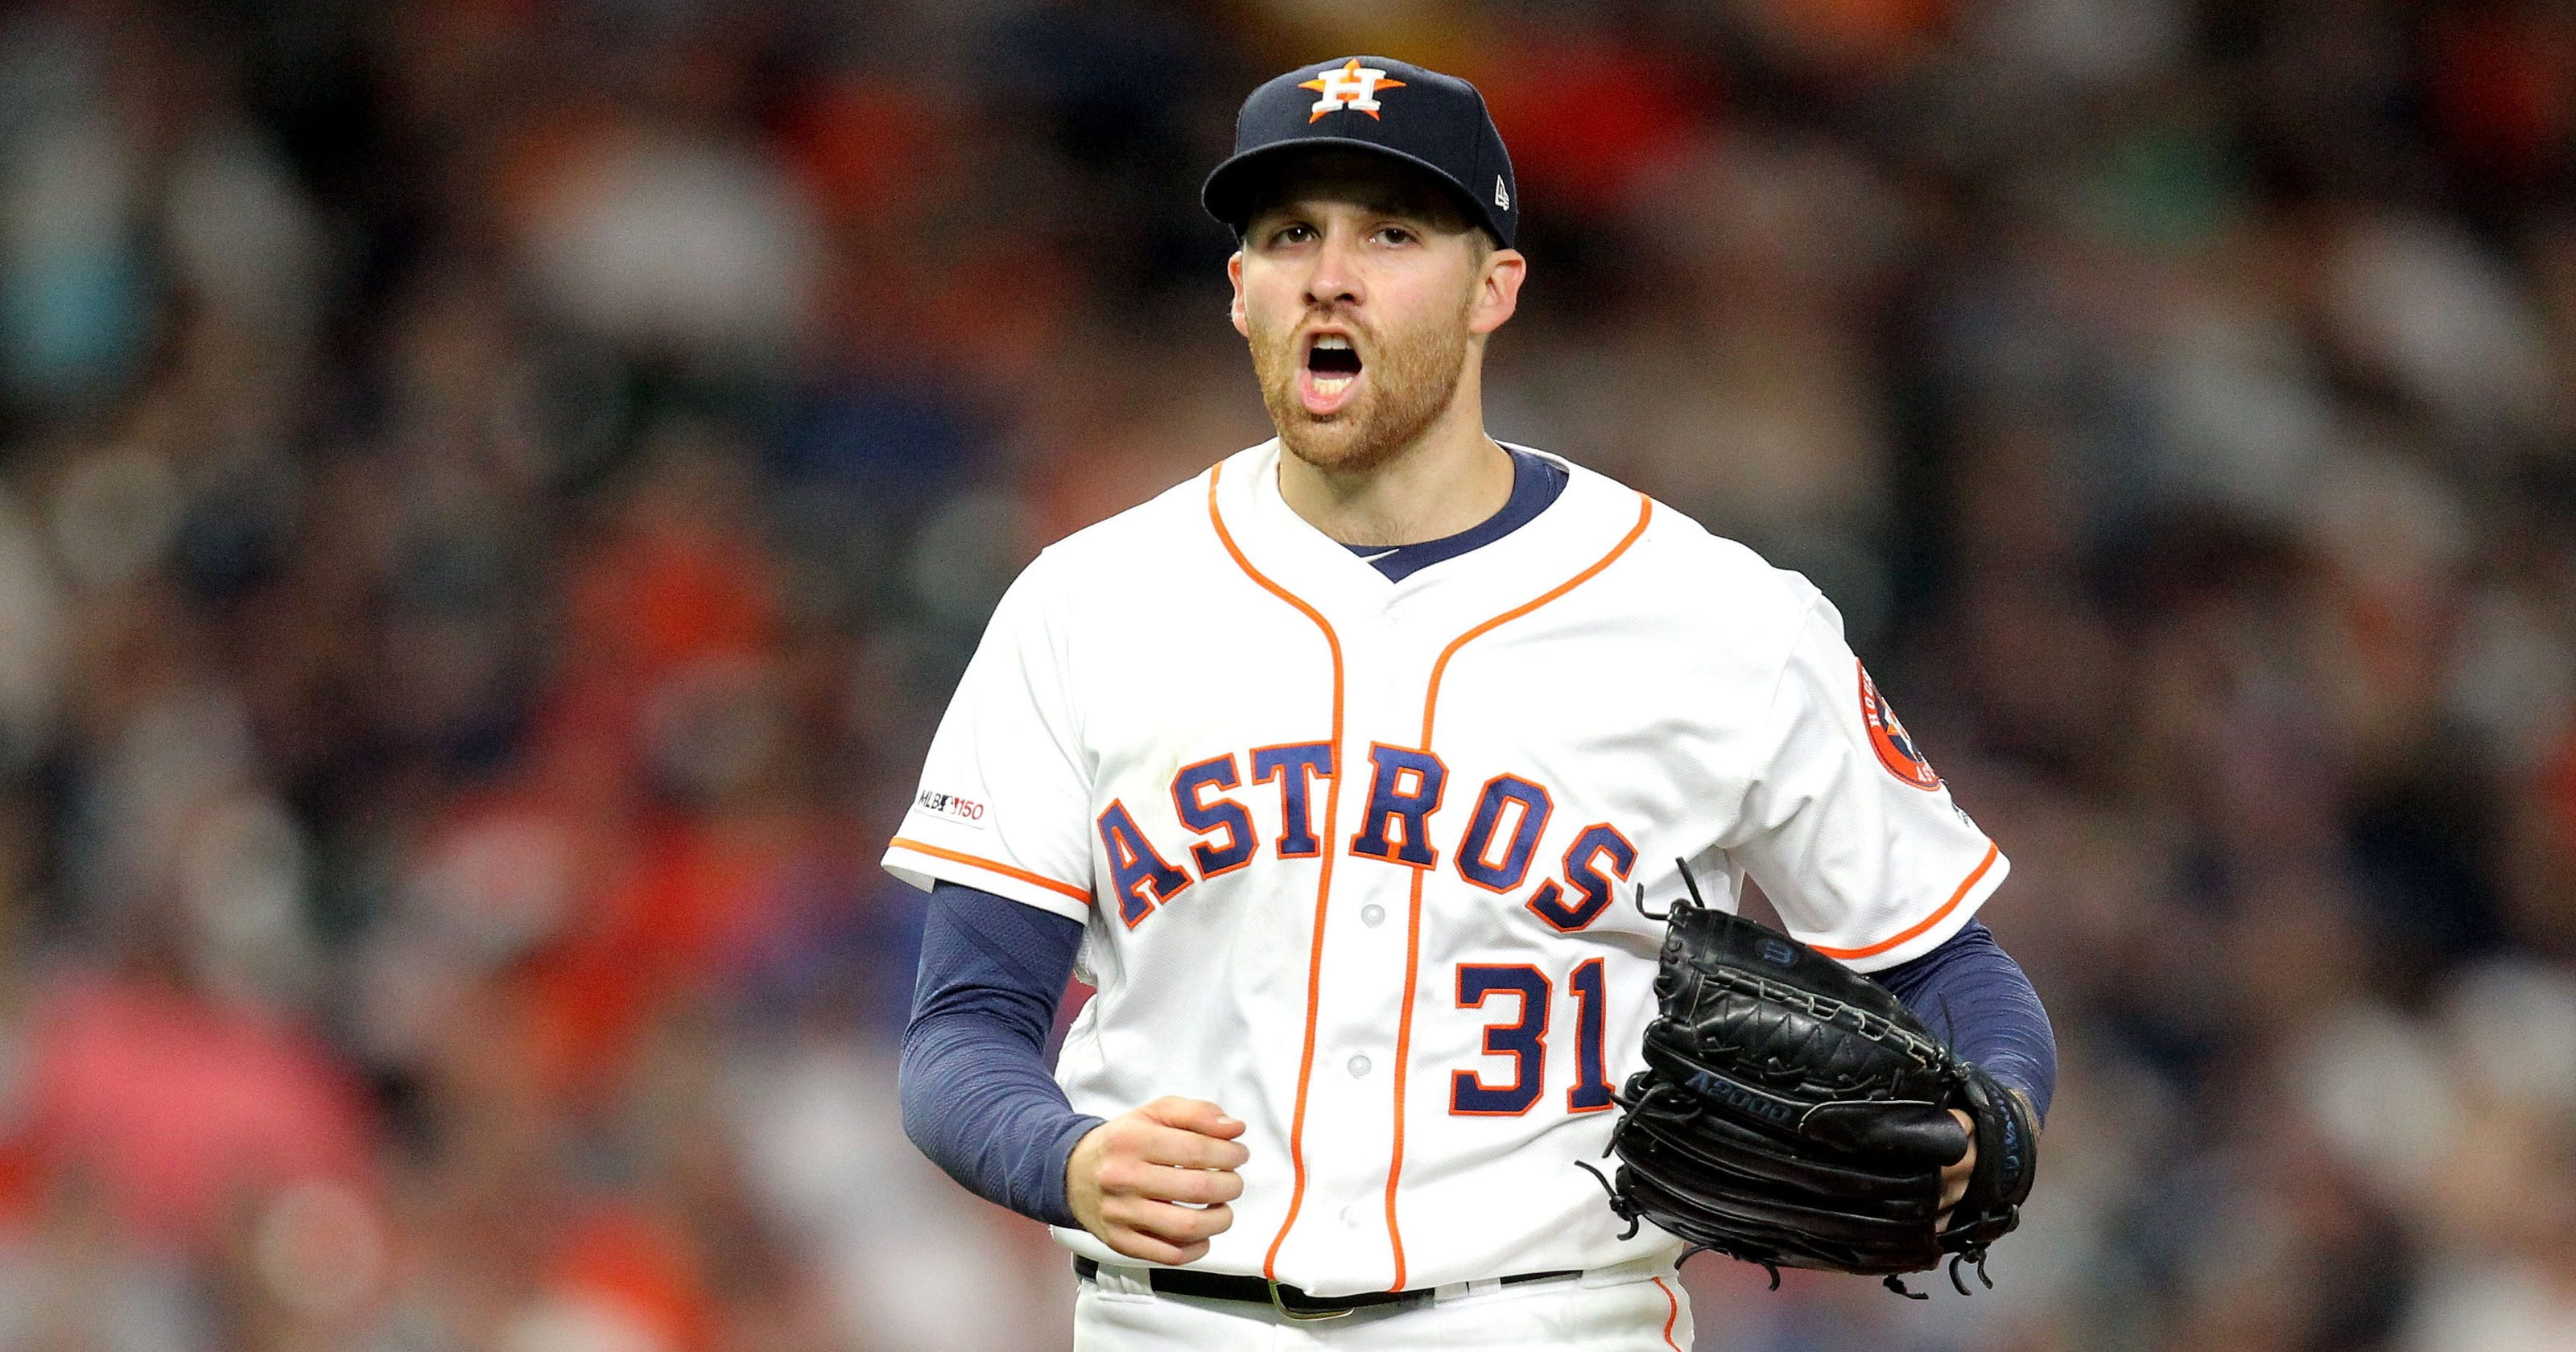 MLB: Astros pitcher dodges line drive with wild 'Matrix' move